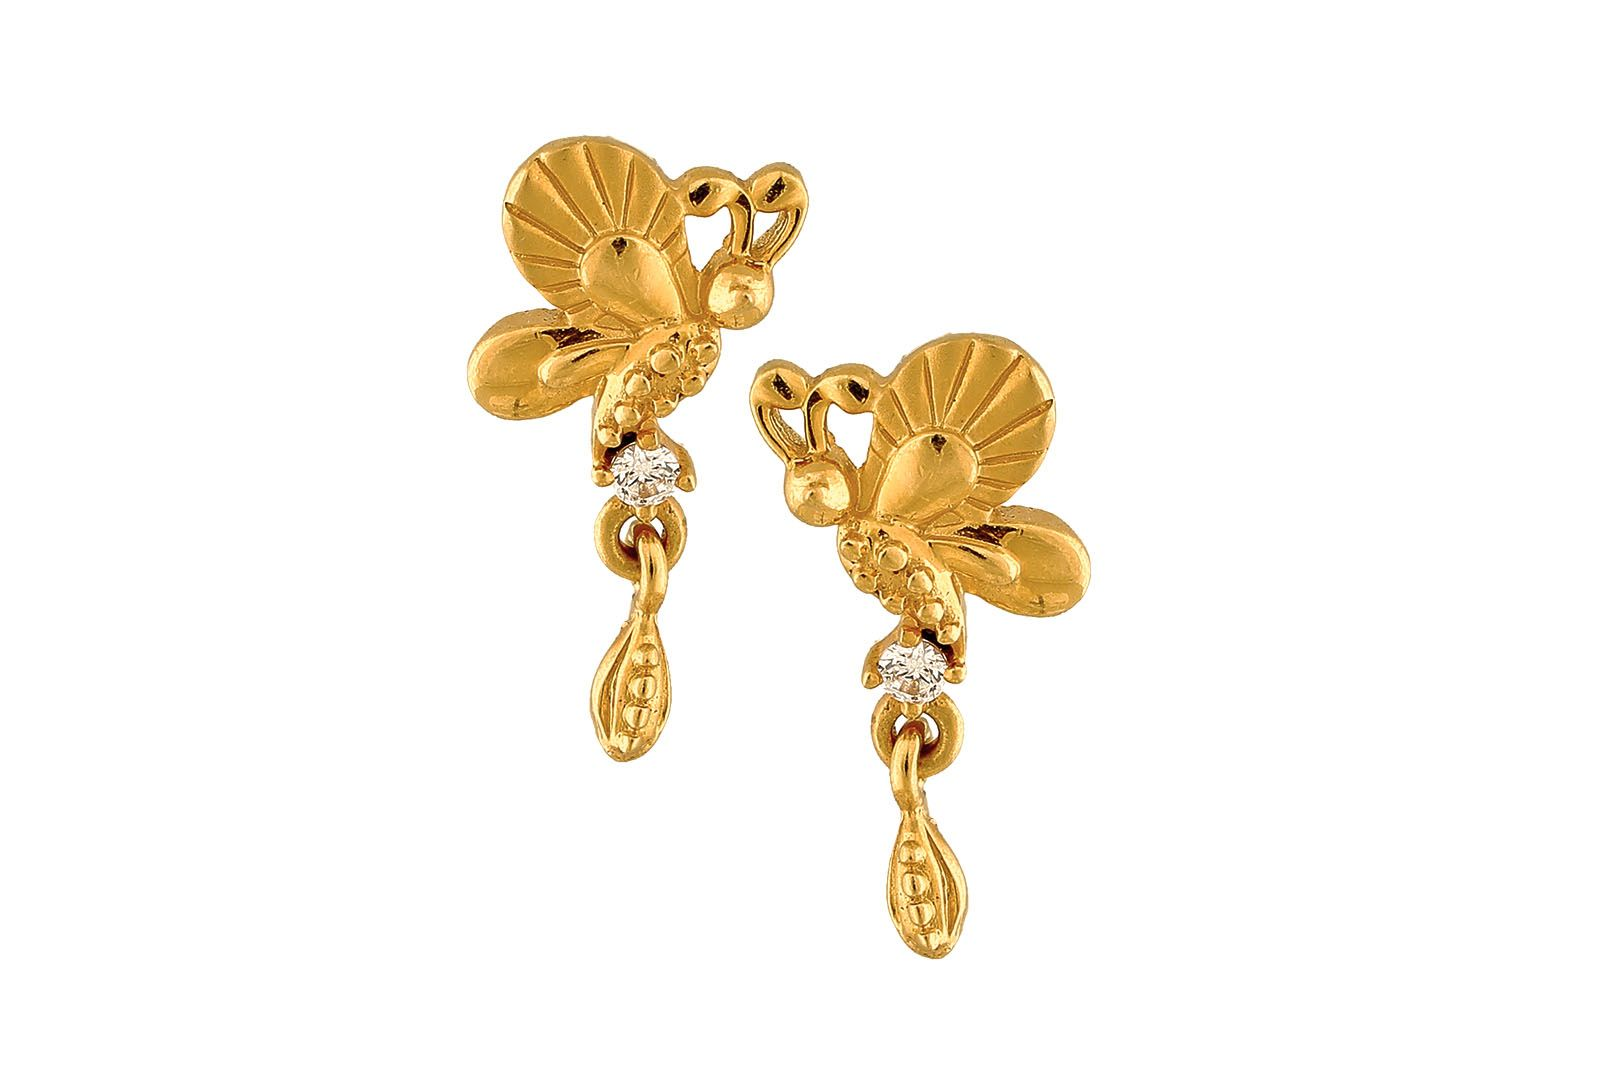 bdaa70e83 Bis hallmarked 22 carat gold earrings , sale price : 5803 , original price  : 6150, visit our website www.nnjewels.com for earrings below rs.10,000